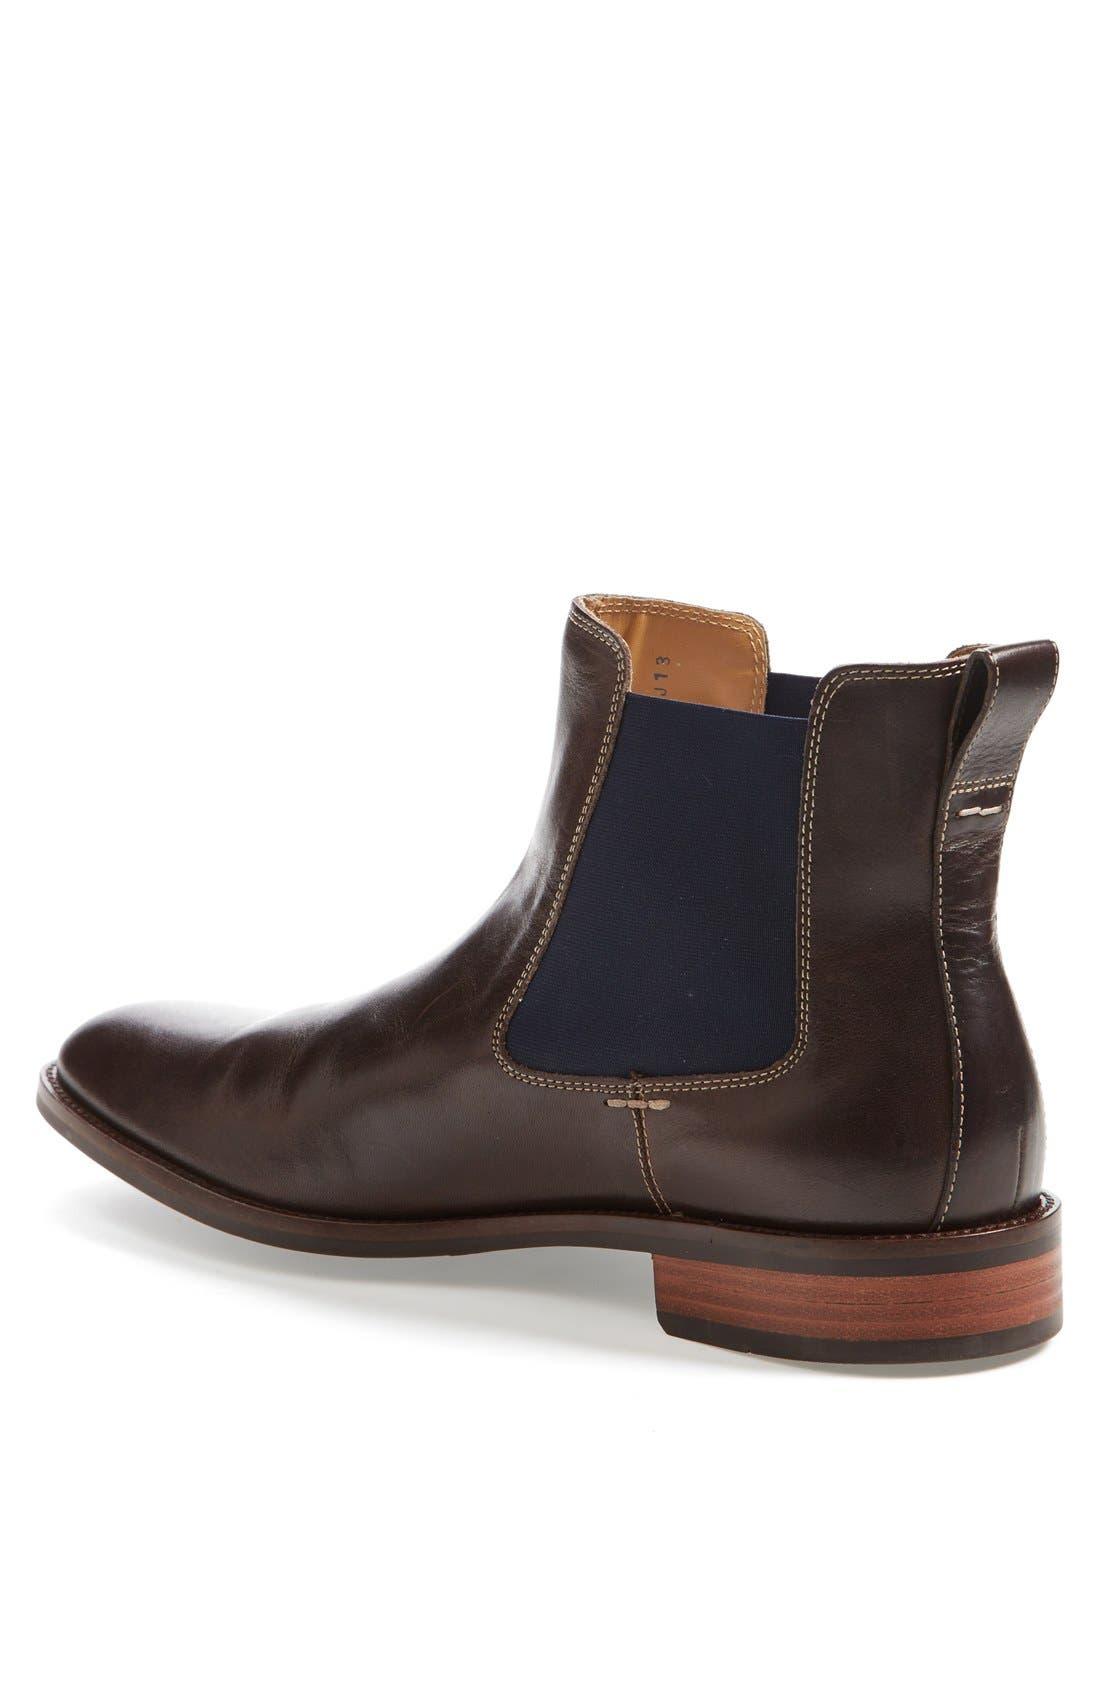 Alternate Image 2  - Cole Haan 'Lenox Hill' Chelsea Boot (Men)